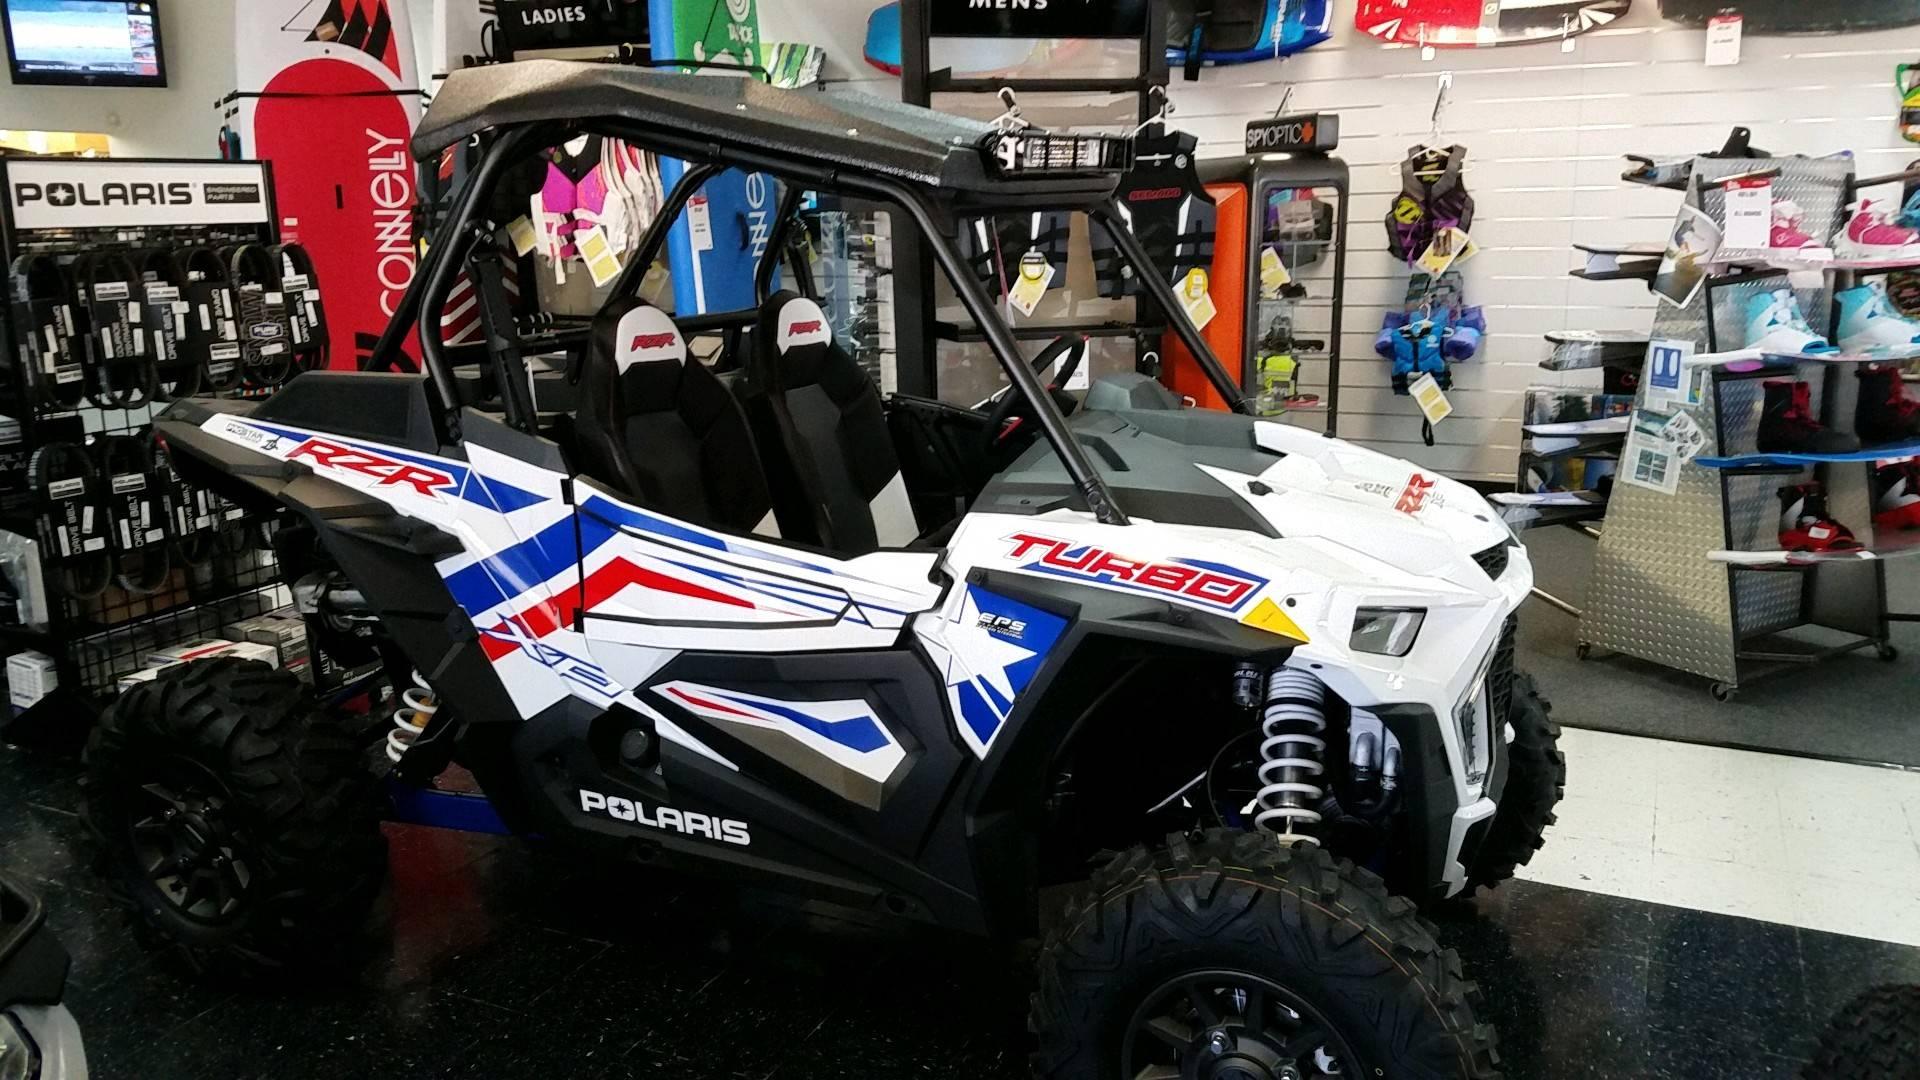 2019 Polaris RZR XP Turbo LE 1